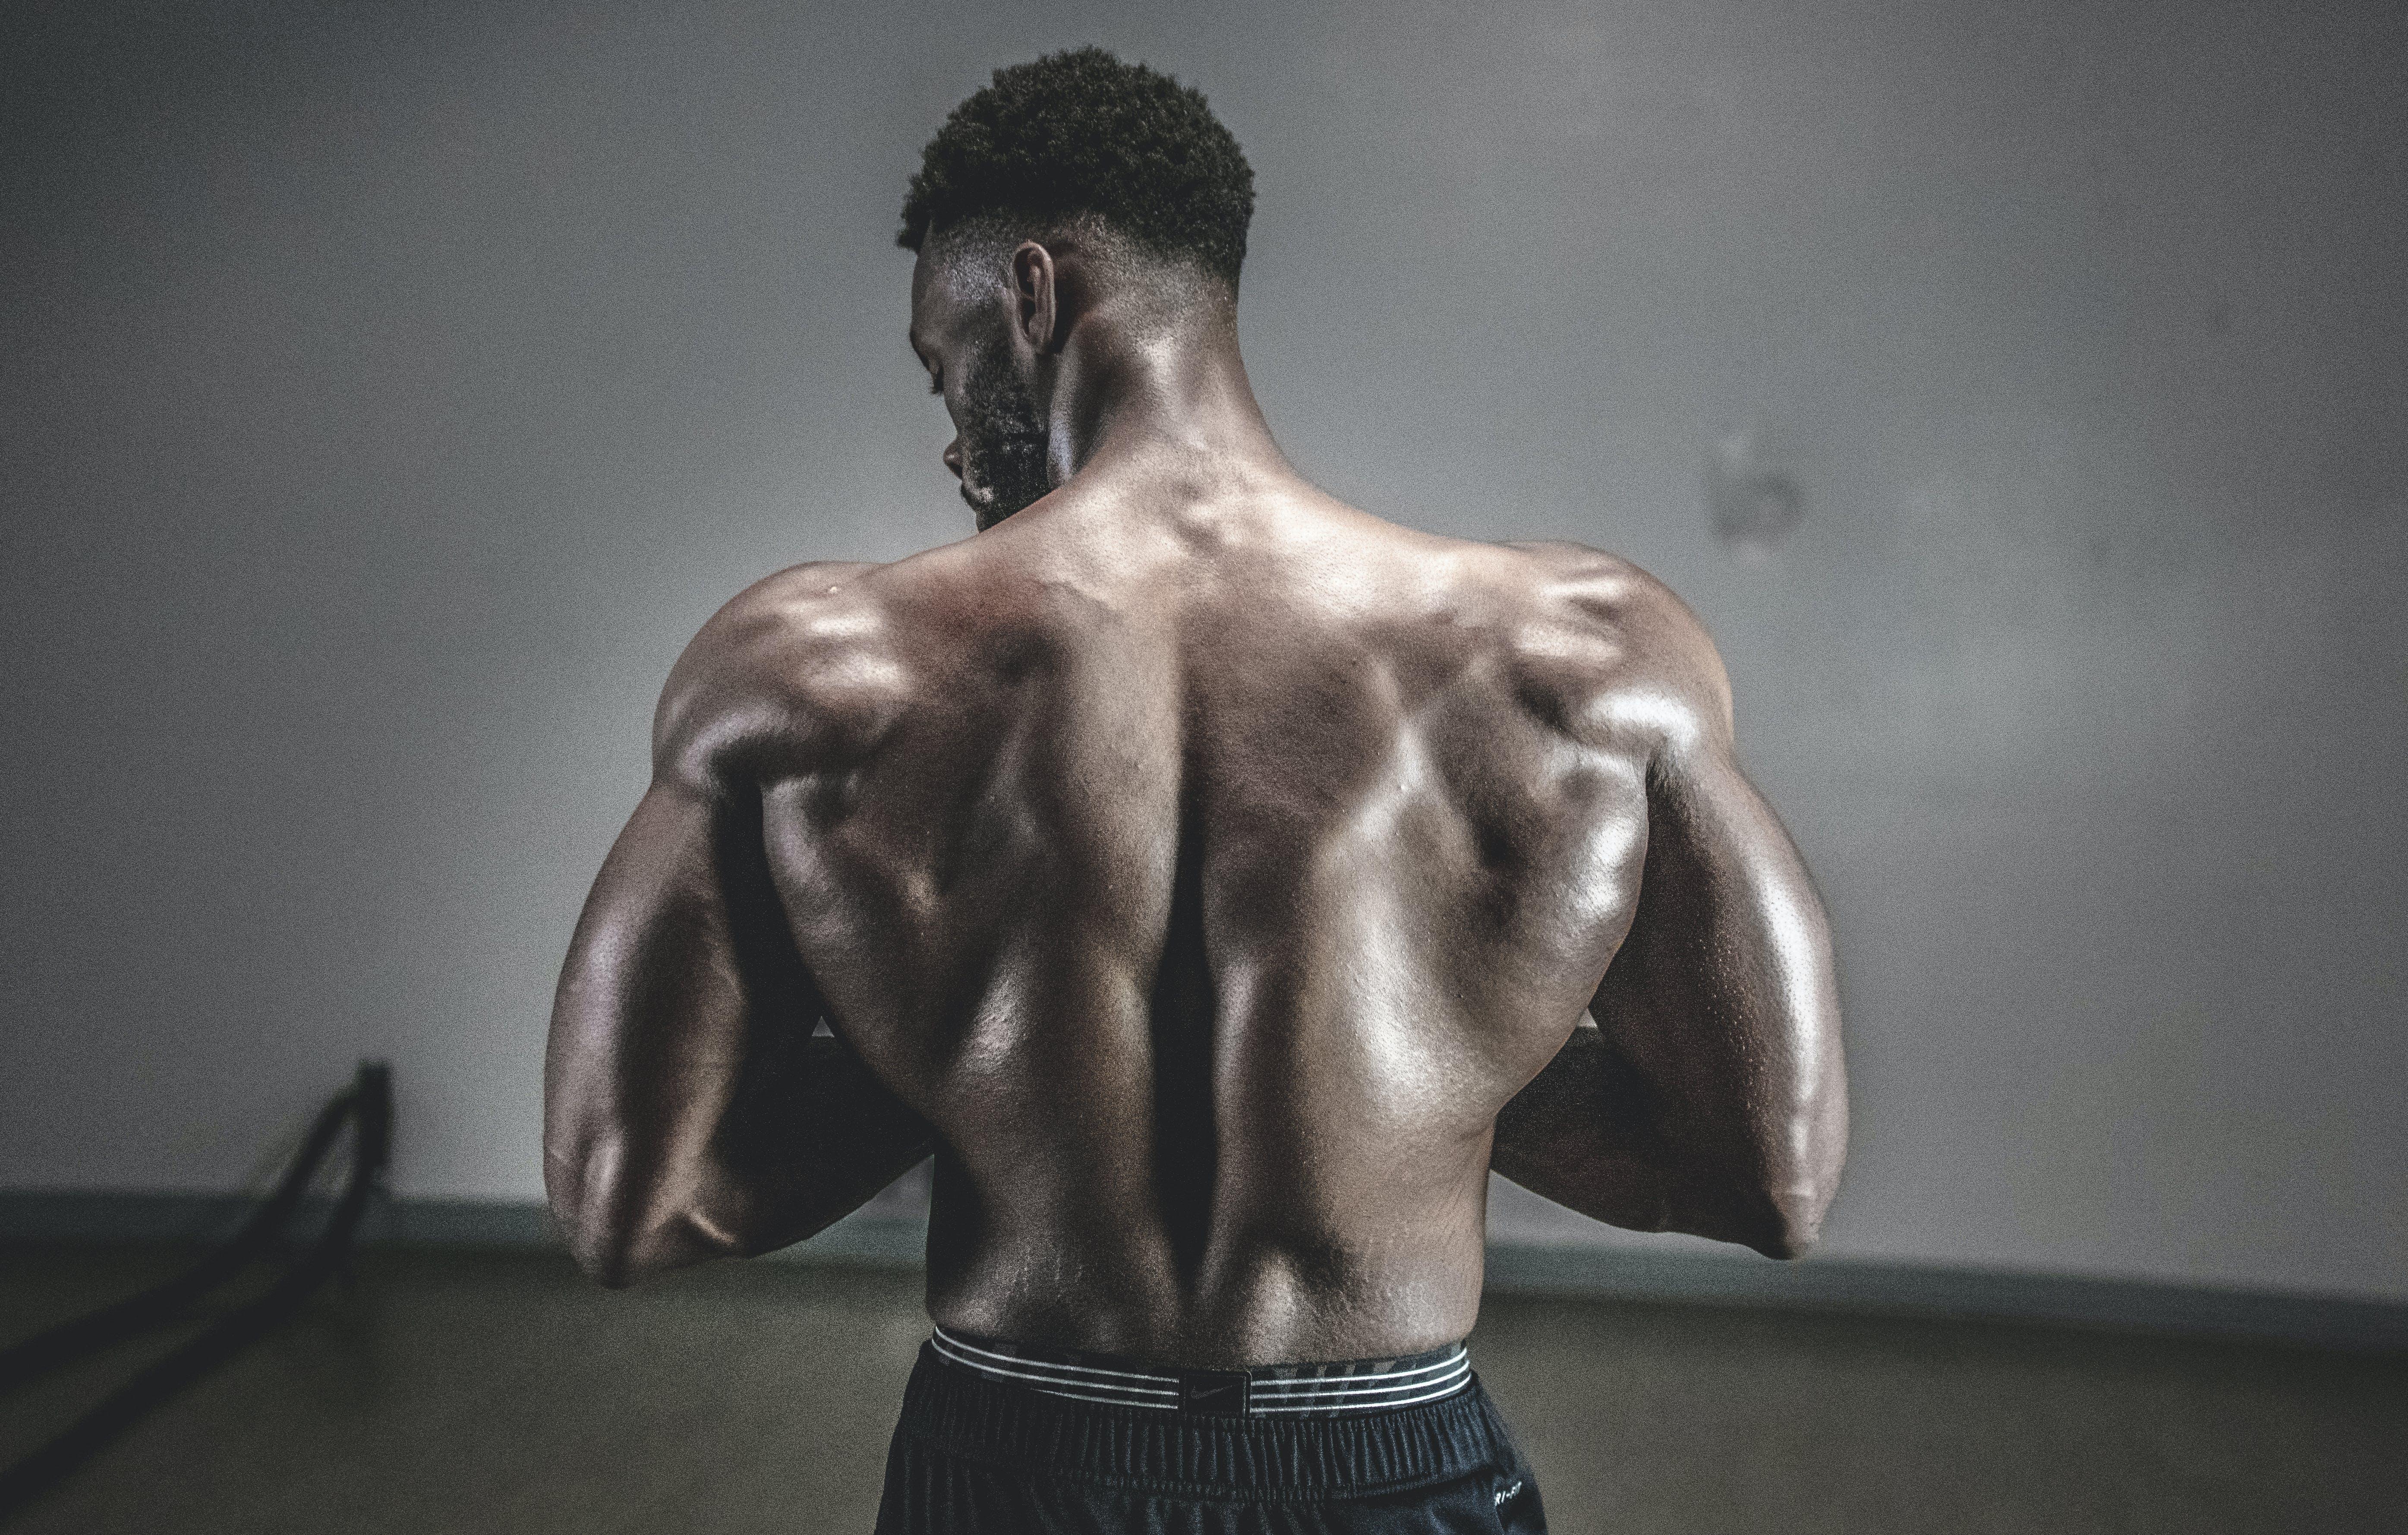 Kostenloses Stock Foto zu bullig, fitness, kerl, körper